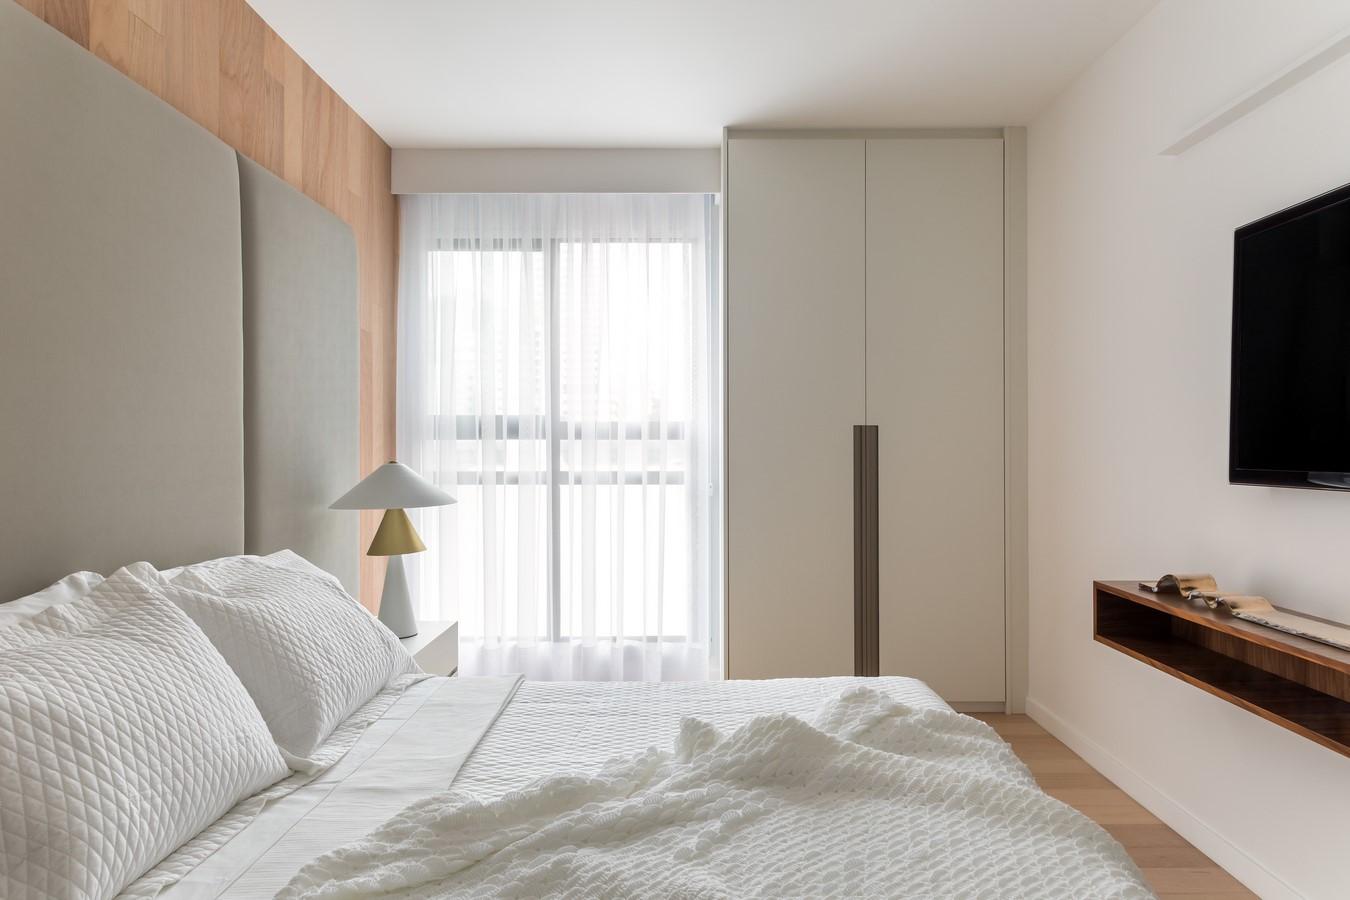 Apartamento RC by Schuchovski Arquitetura - Sheet2